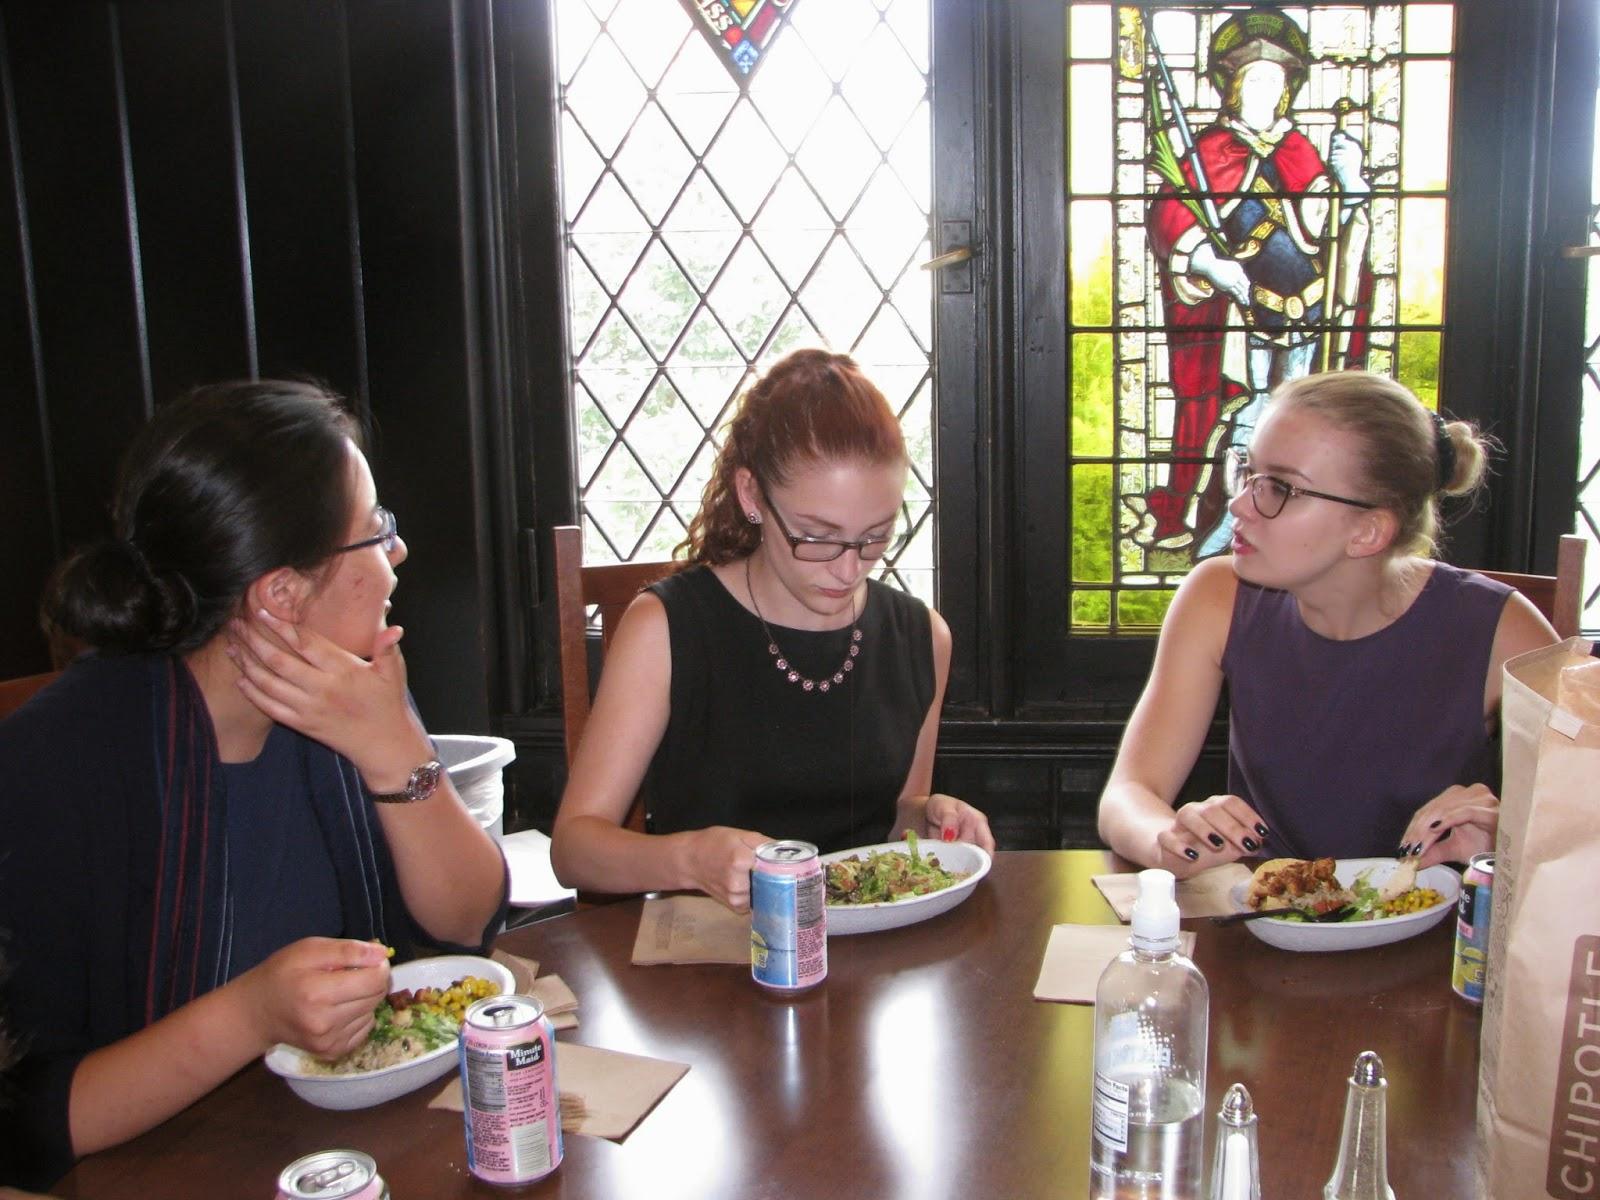 Kinder Garden: School Of Public Service Blog: Panel On Ukraine-Russia